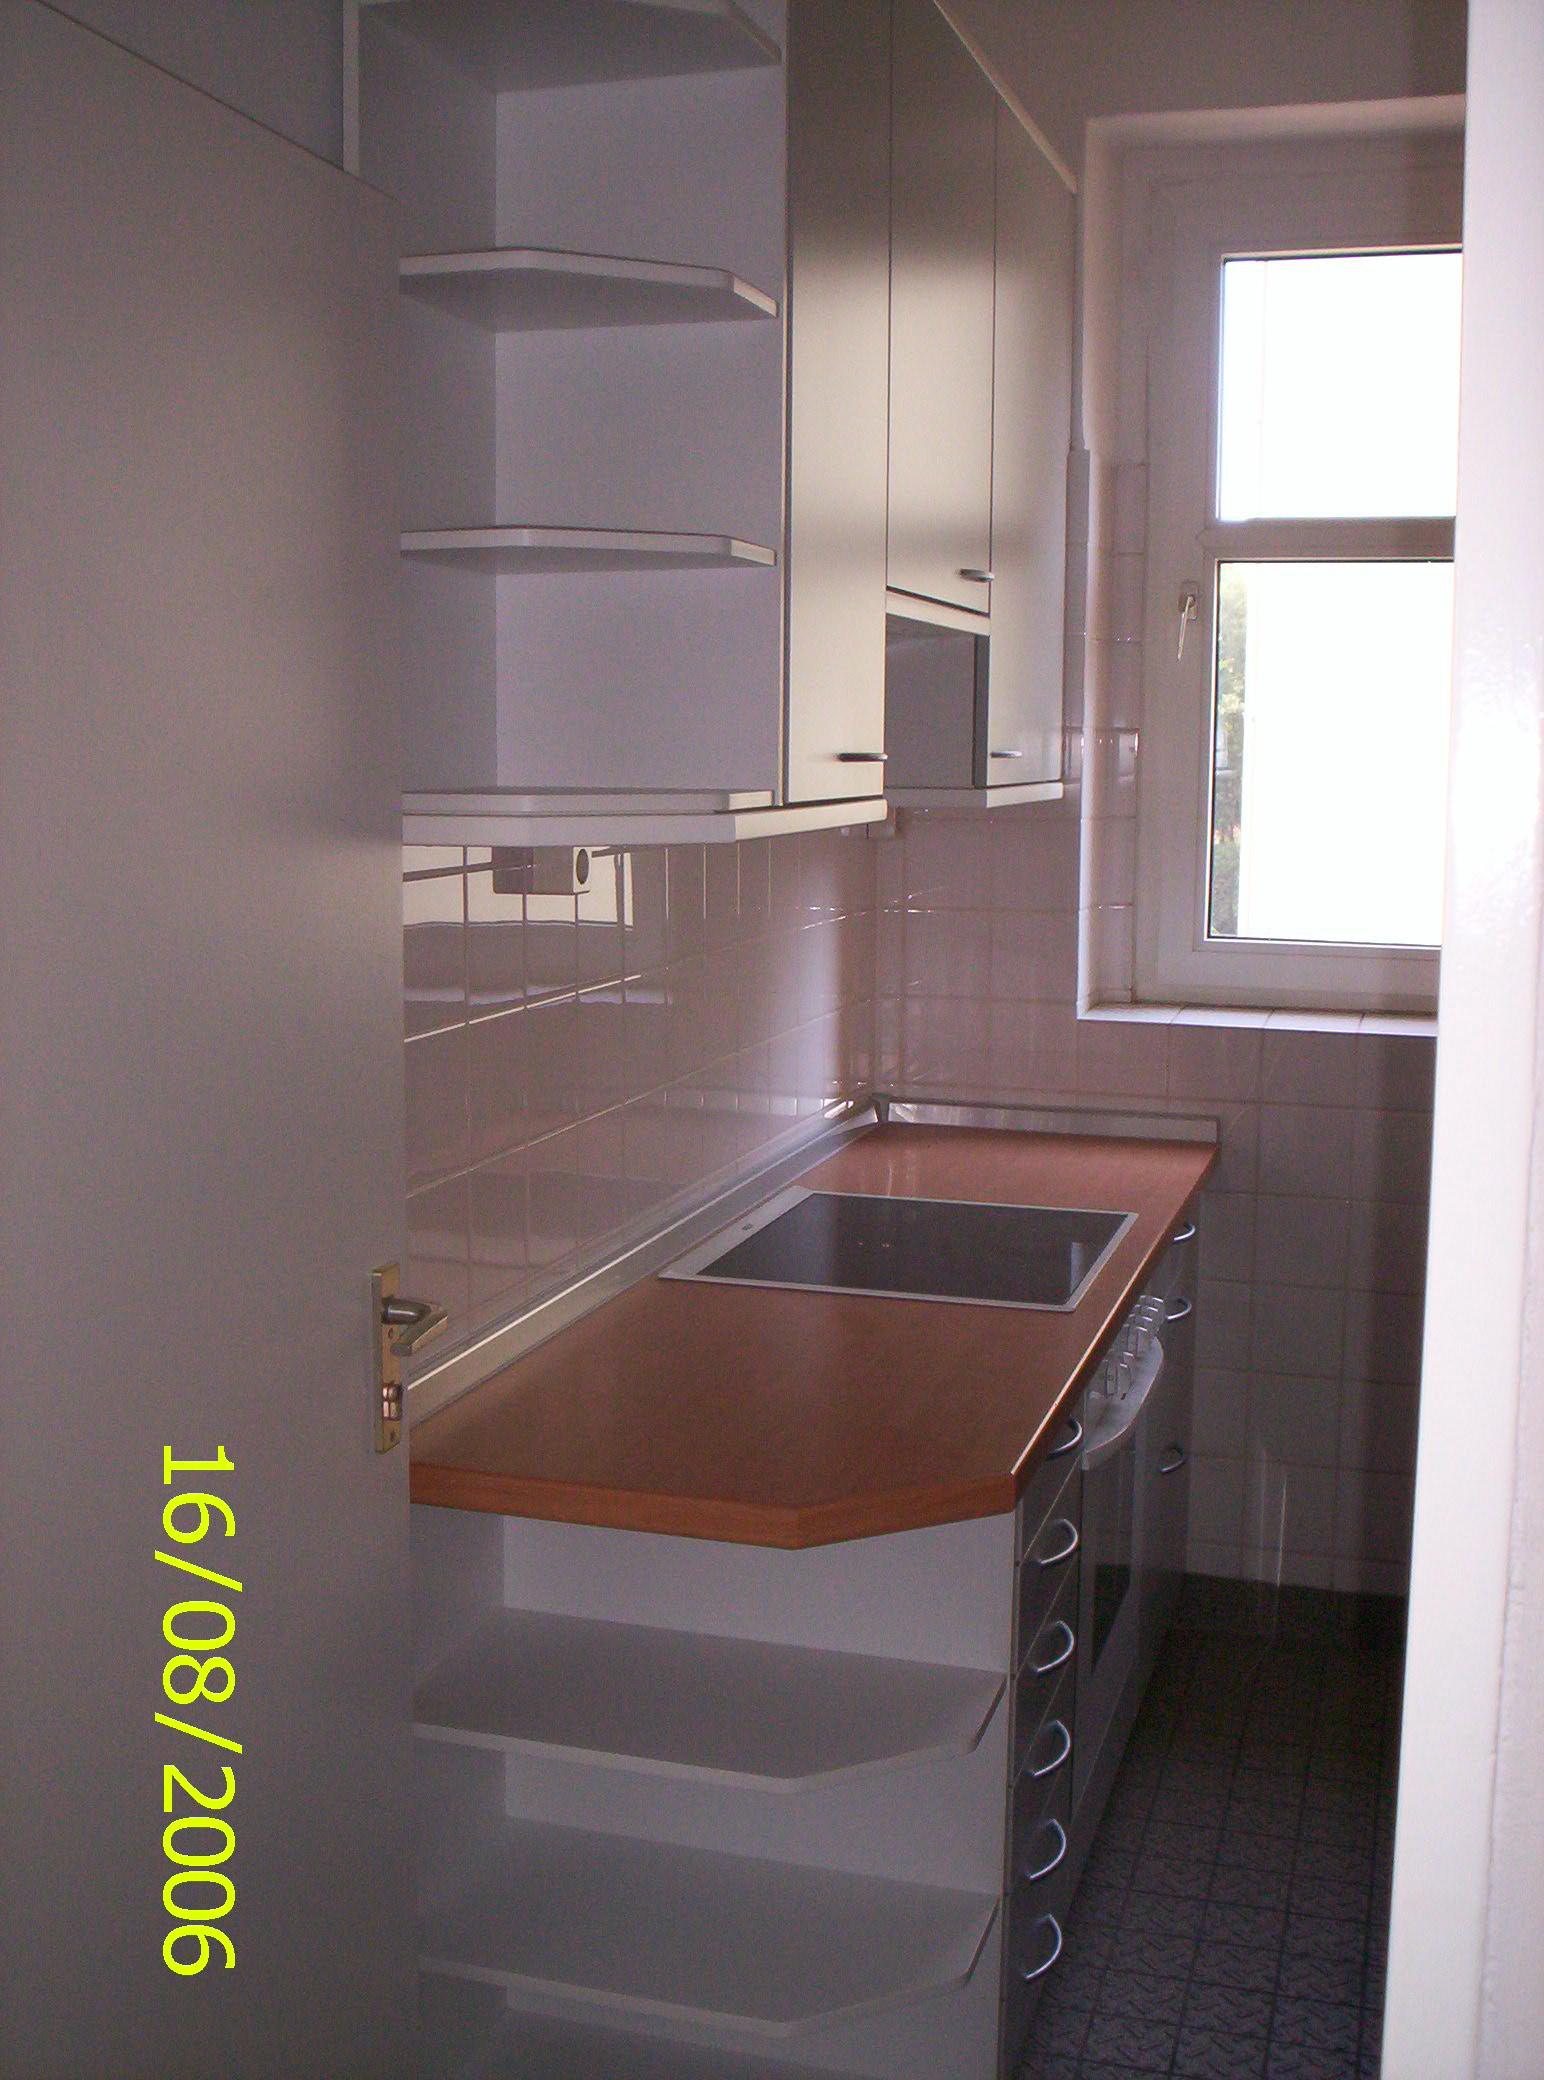 k chenideen k chen abverkauf k chen abverkauf gebraucht k chen single kuechen gebraucht. Black Bedroom Furniture Sets. Home Design Ideas